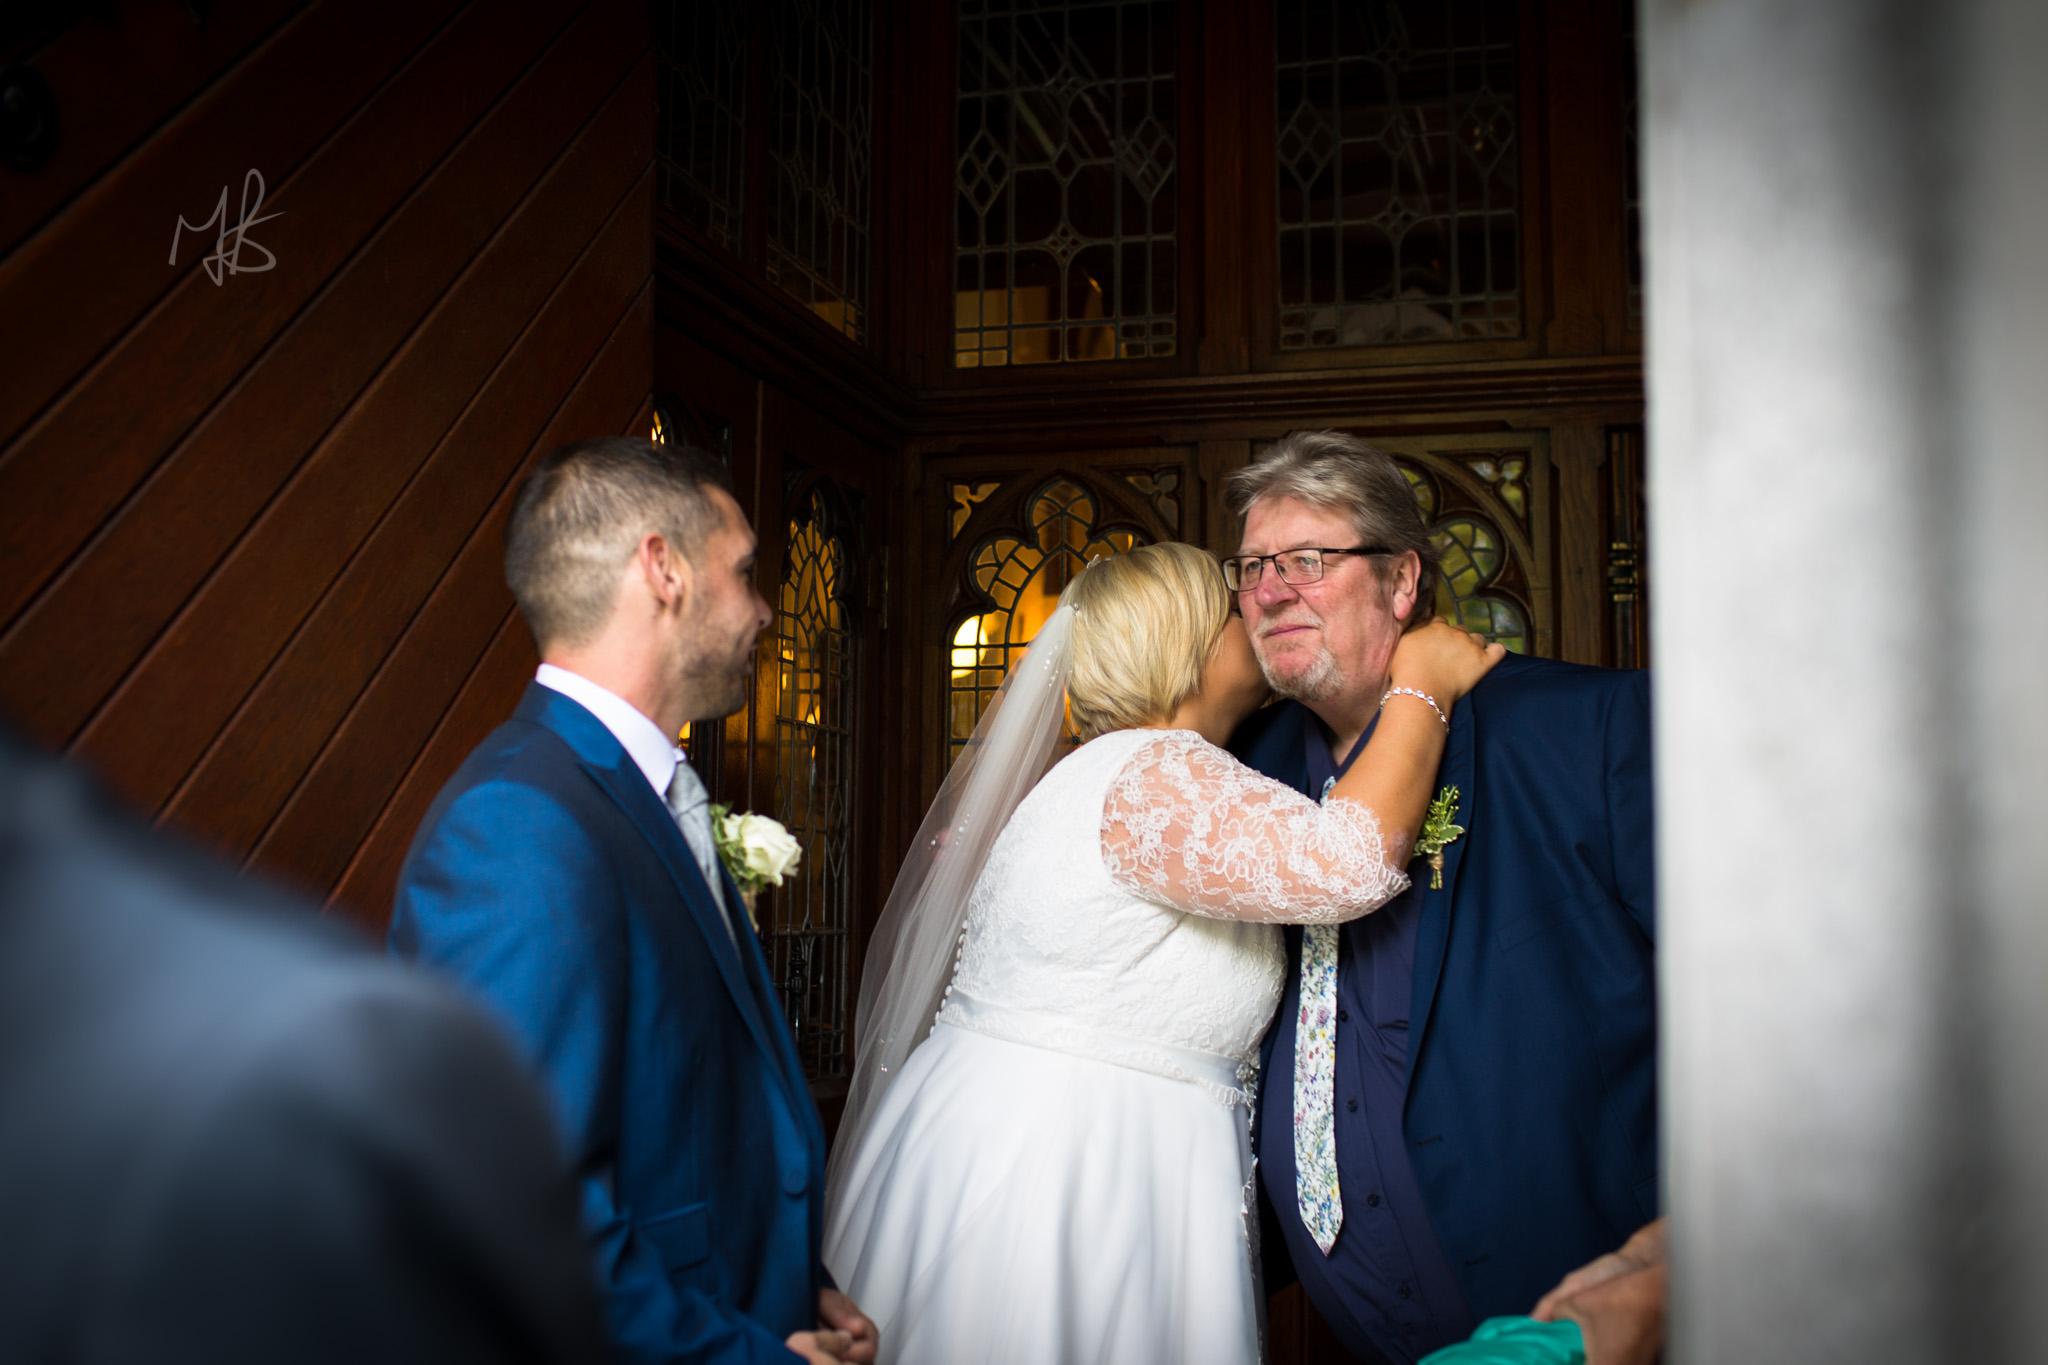 Northern-Ireland-Wedding-Photographer-Mark-Barnes-Ballymena_wedding-photography-Leighinmohr-House-Seamas_Alanna_For-web-24.jpg